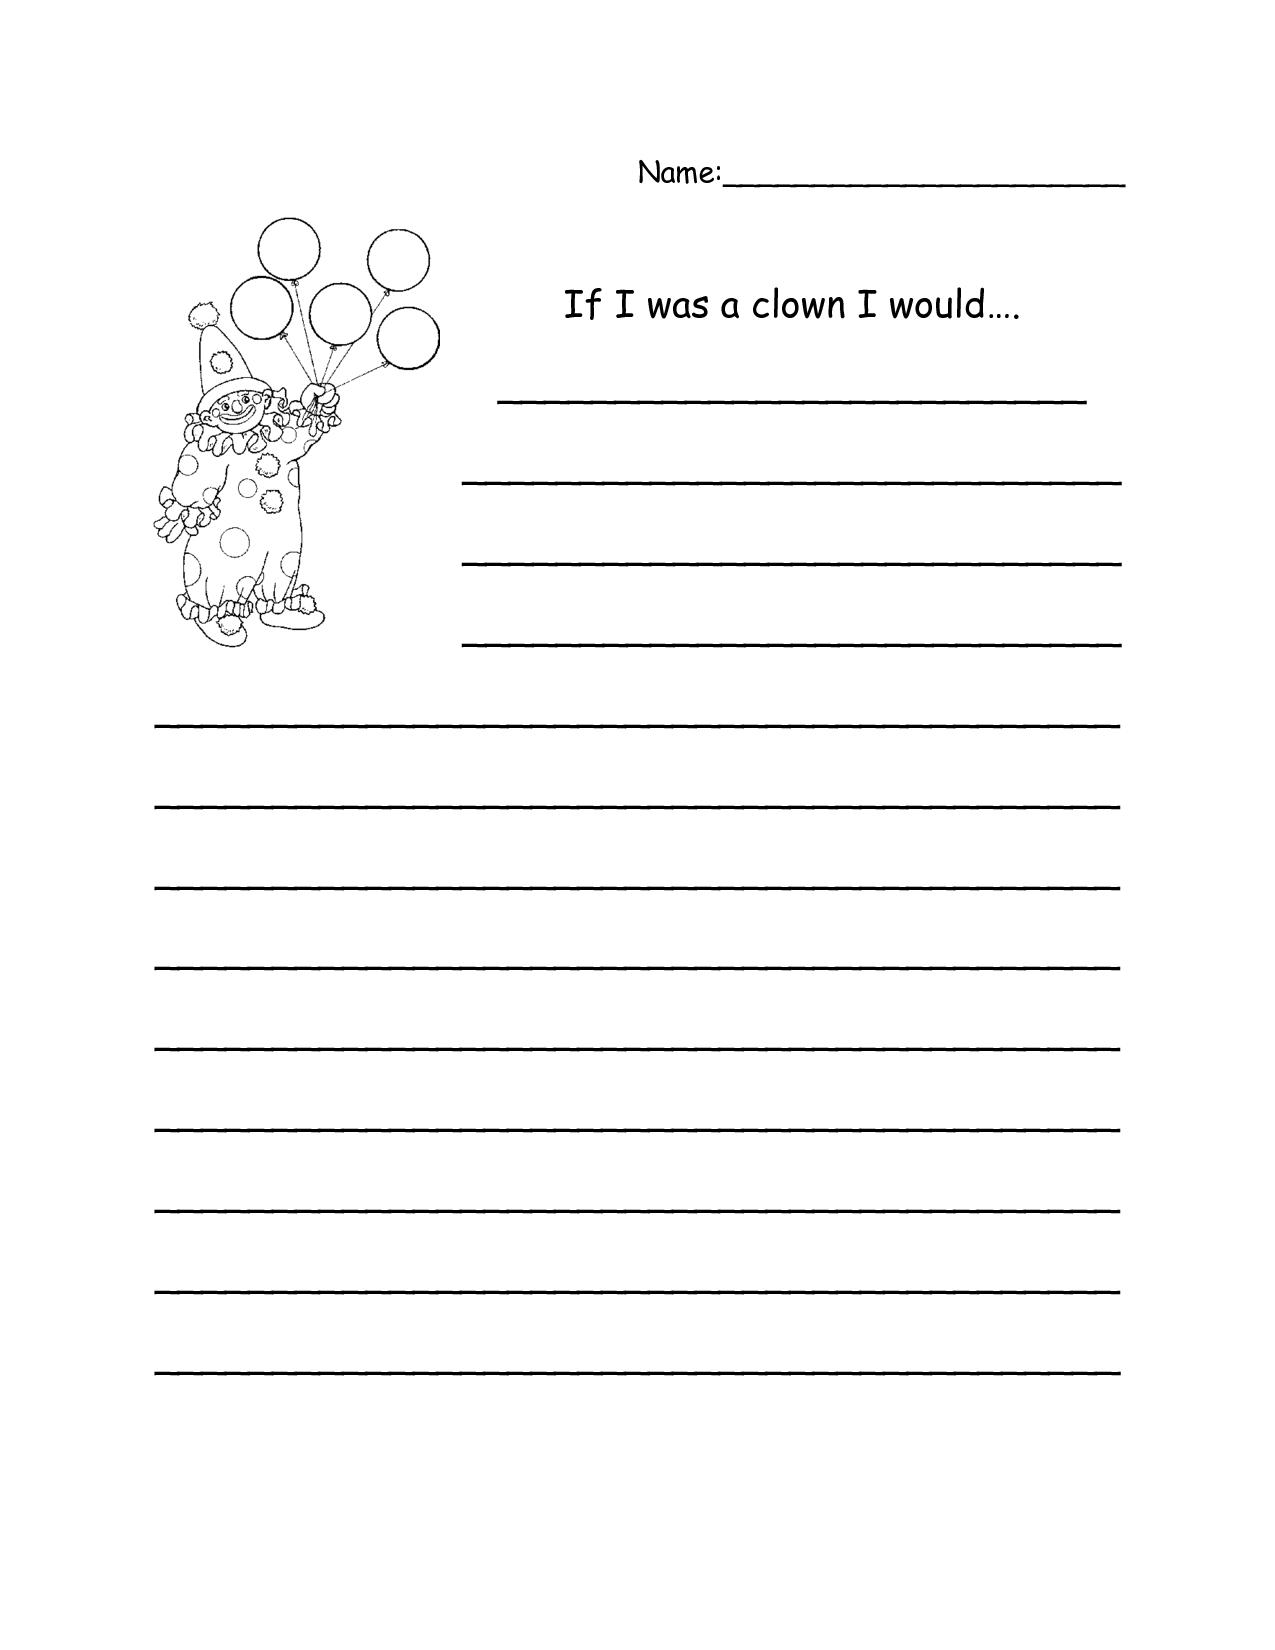 Coventry university dissertation cover sheet